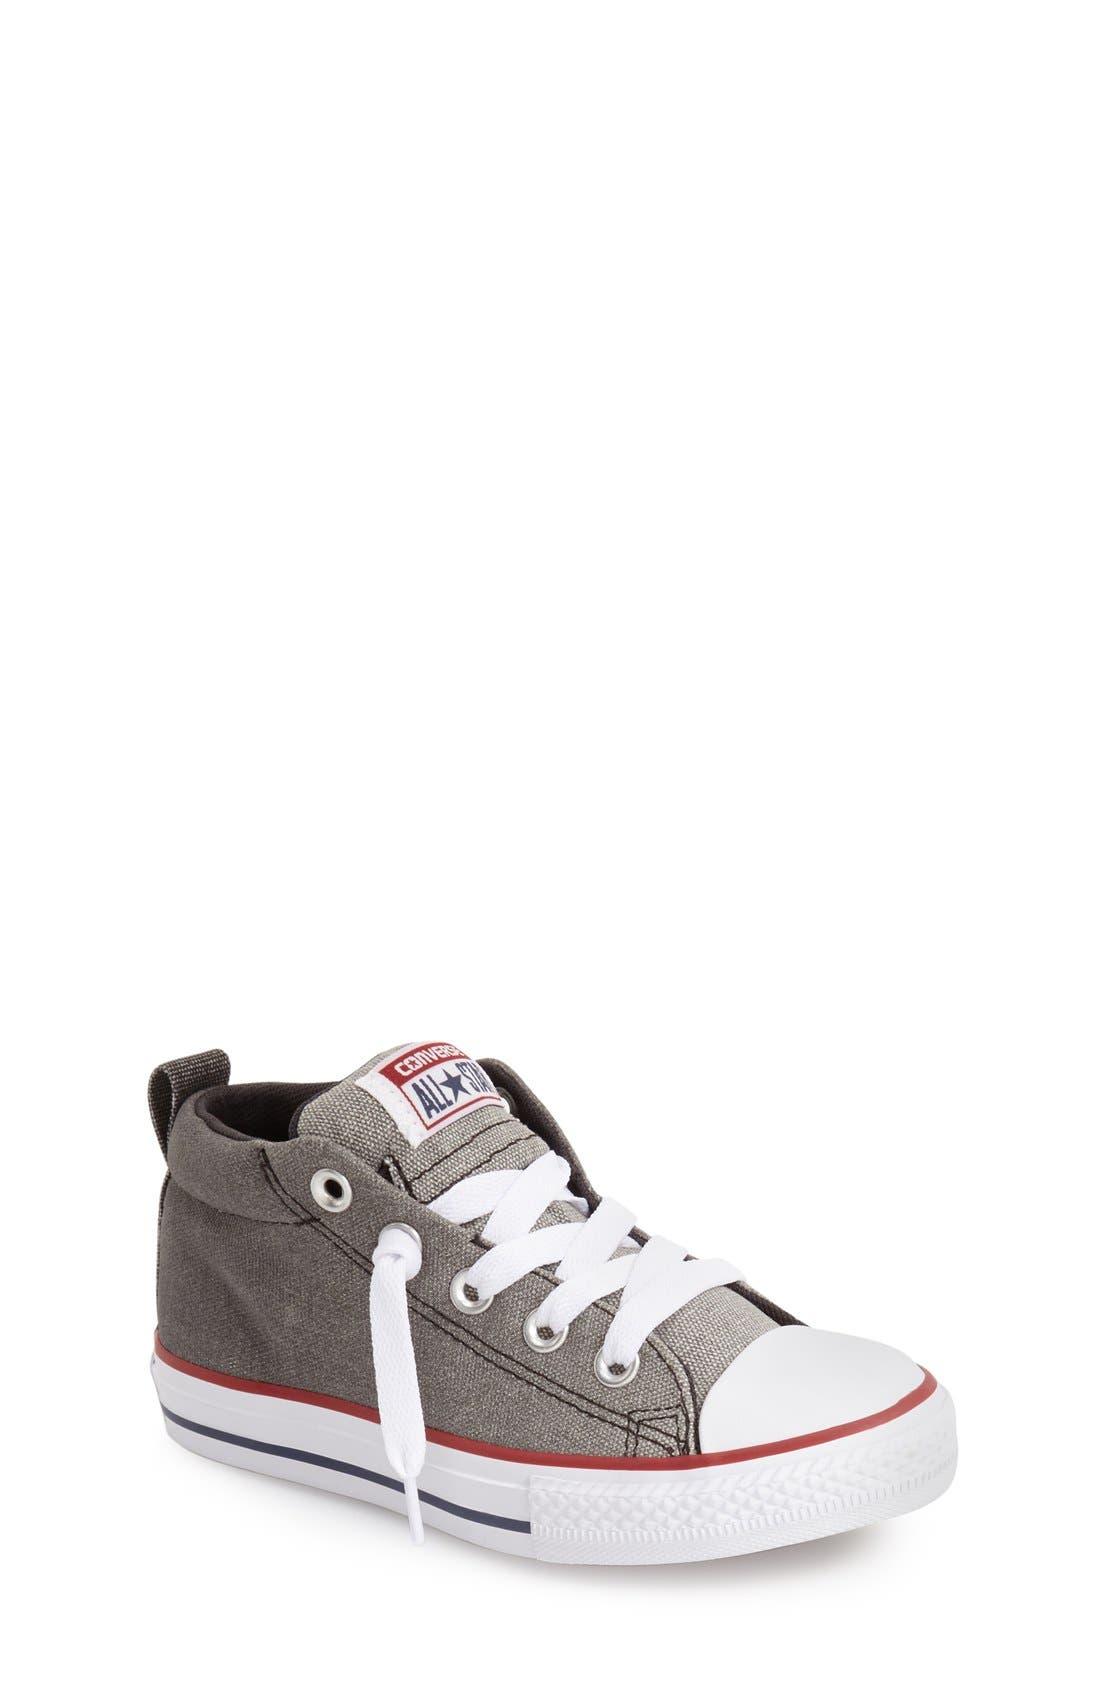 Alternate Image 1 Selected - Converse Chuck Taylor® All Star® 'CTAS Street' Mid Sneaker (Baby, Walker, Toddler Little Kid & Big Kid)